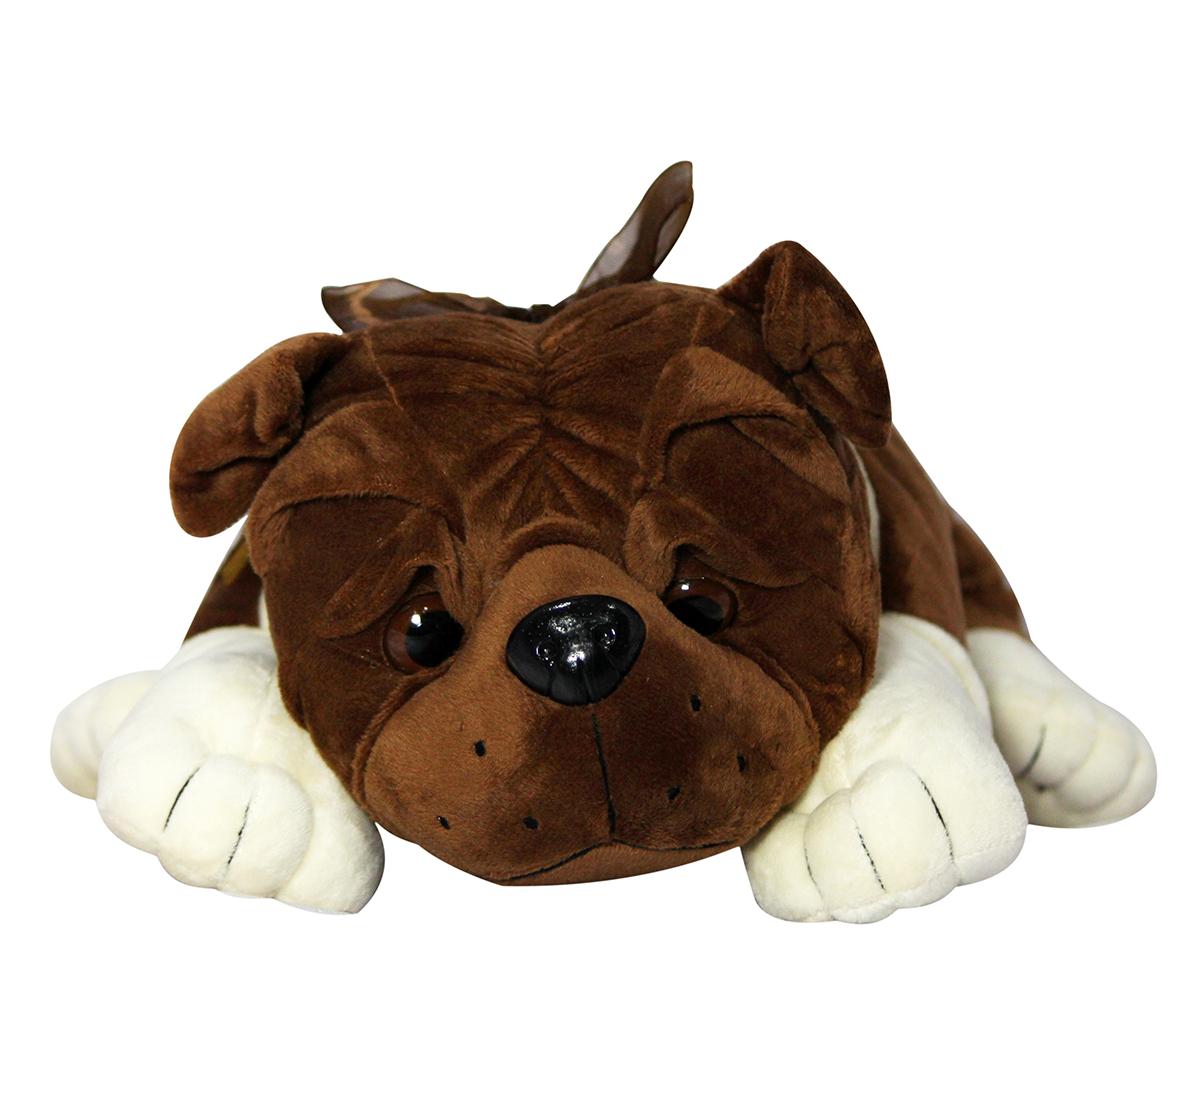 Soft Buddies   Soft Buddies Lying Bull Dog Large, Unisex, 9M+ (Dark Brown)